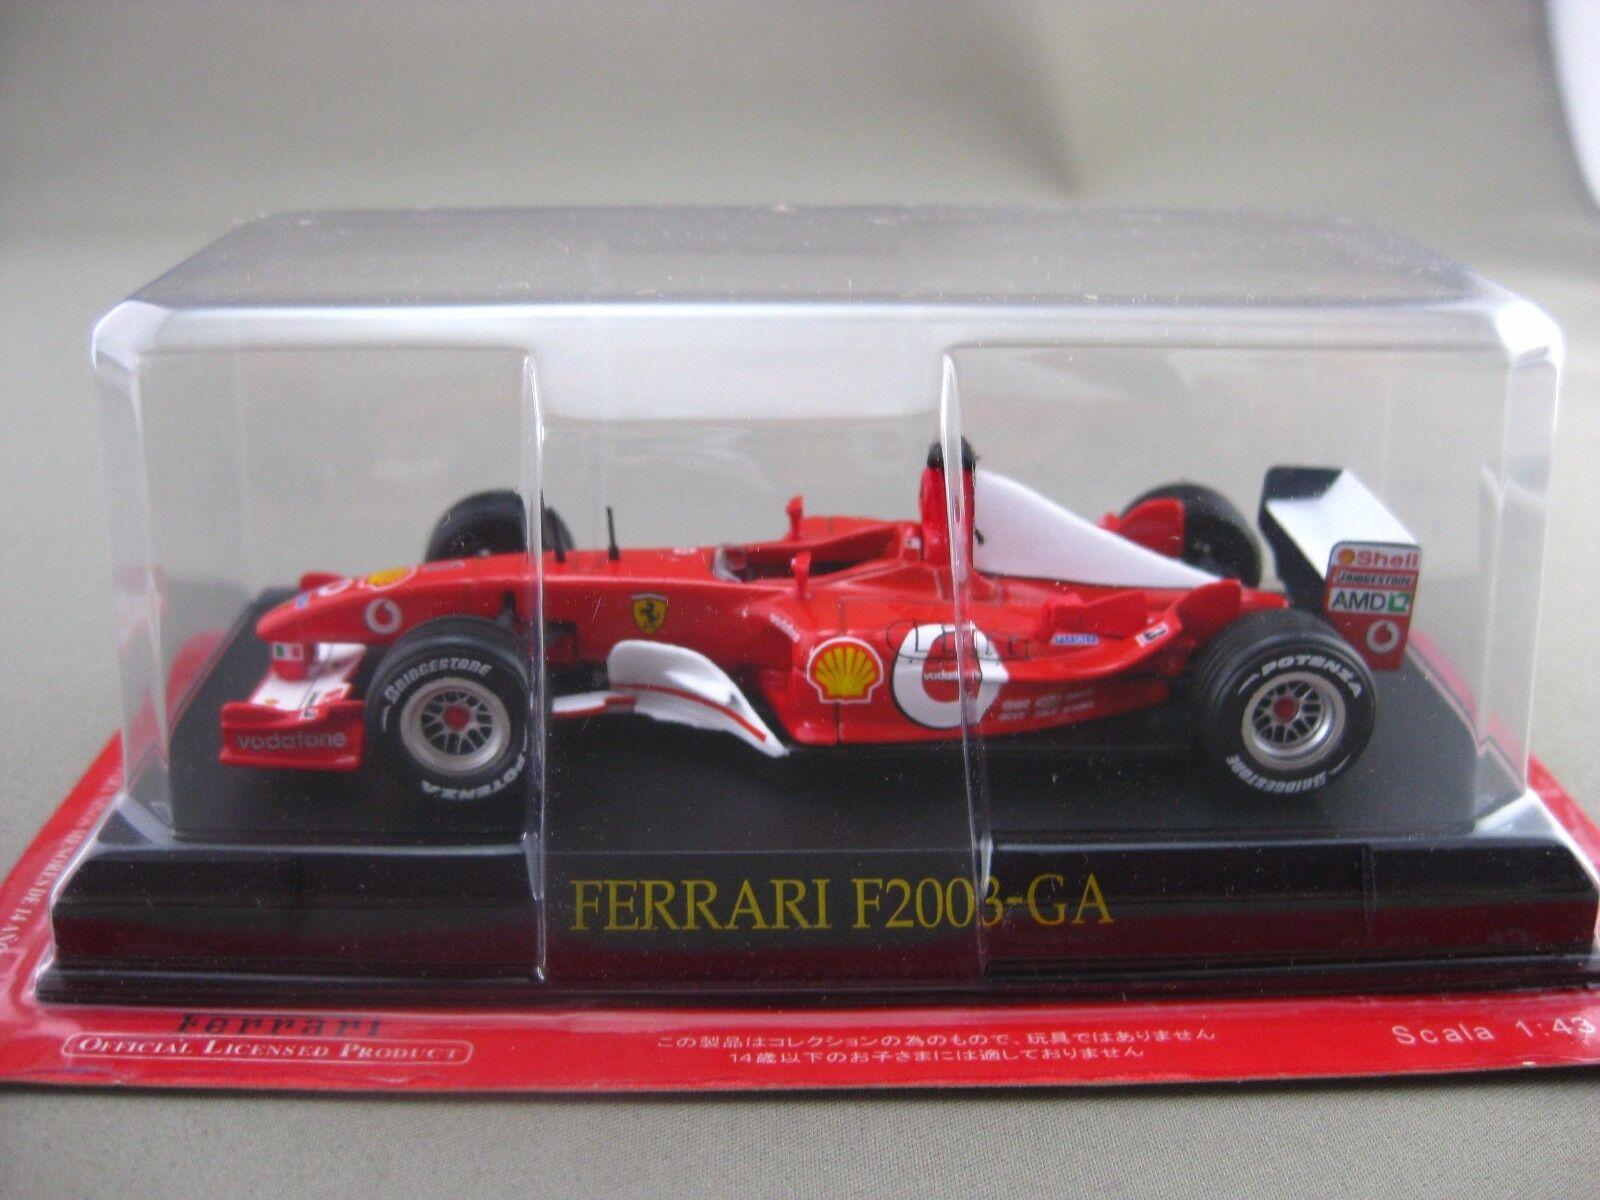 Ferrari F2003-GA Hachette 1 43 Diecast Car Vol.74